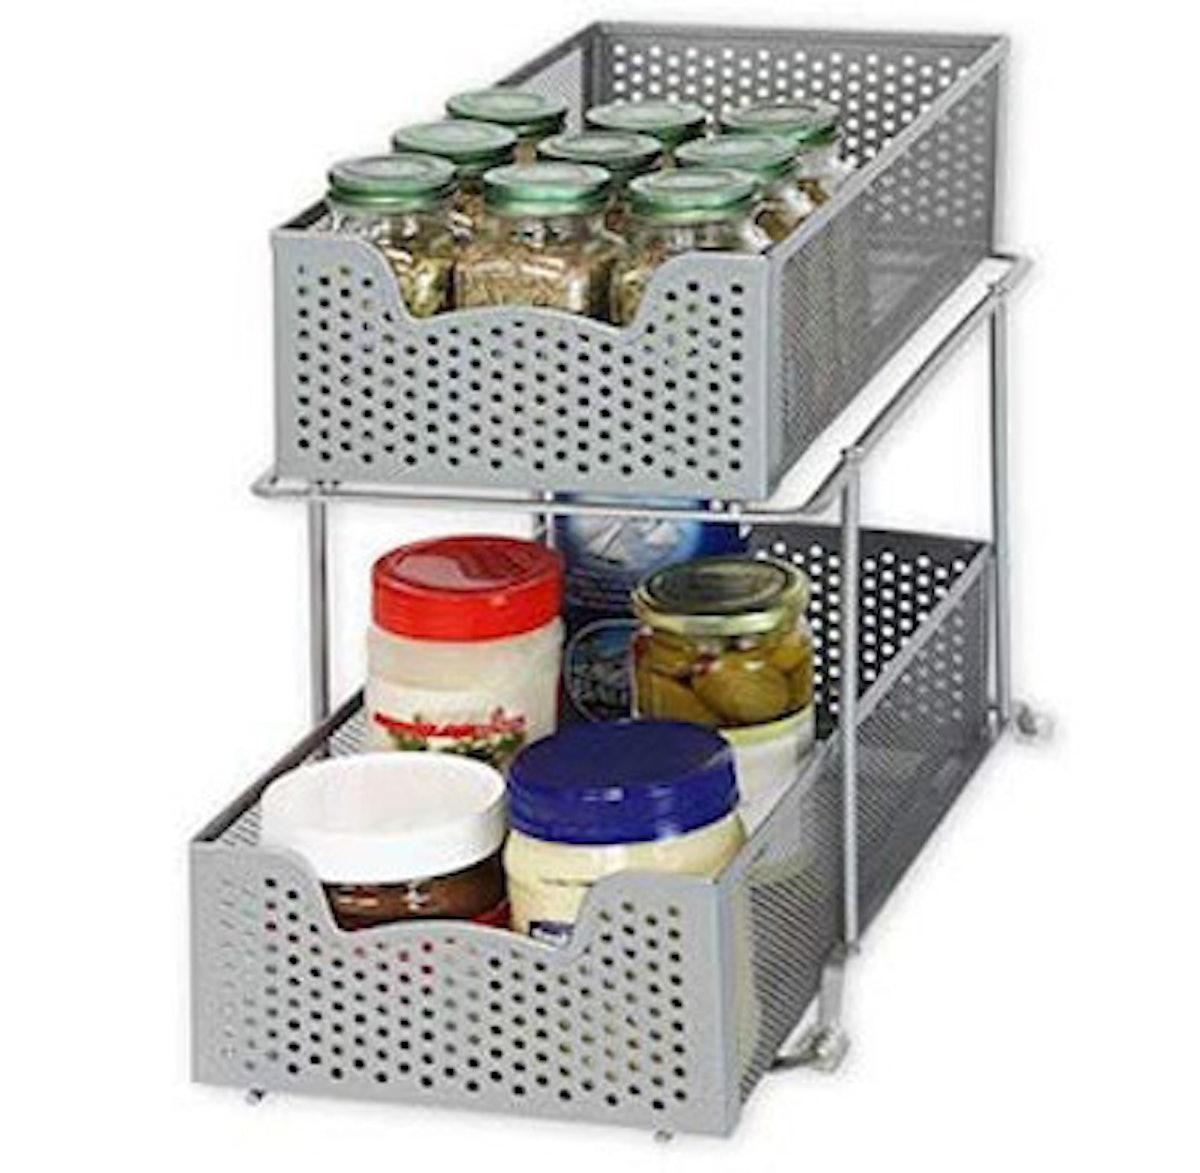 SimpleHouseware 2 Tier Sliding Cabinet Basket Organizer Drawer